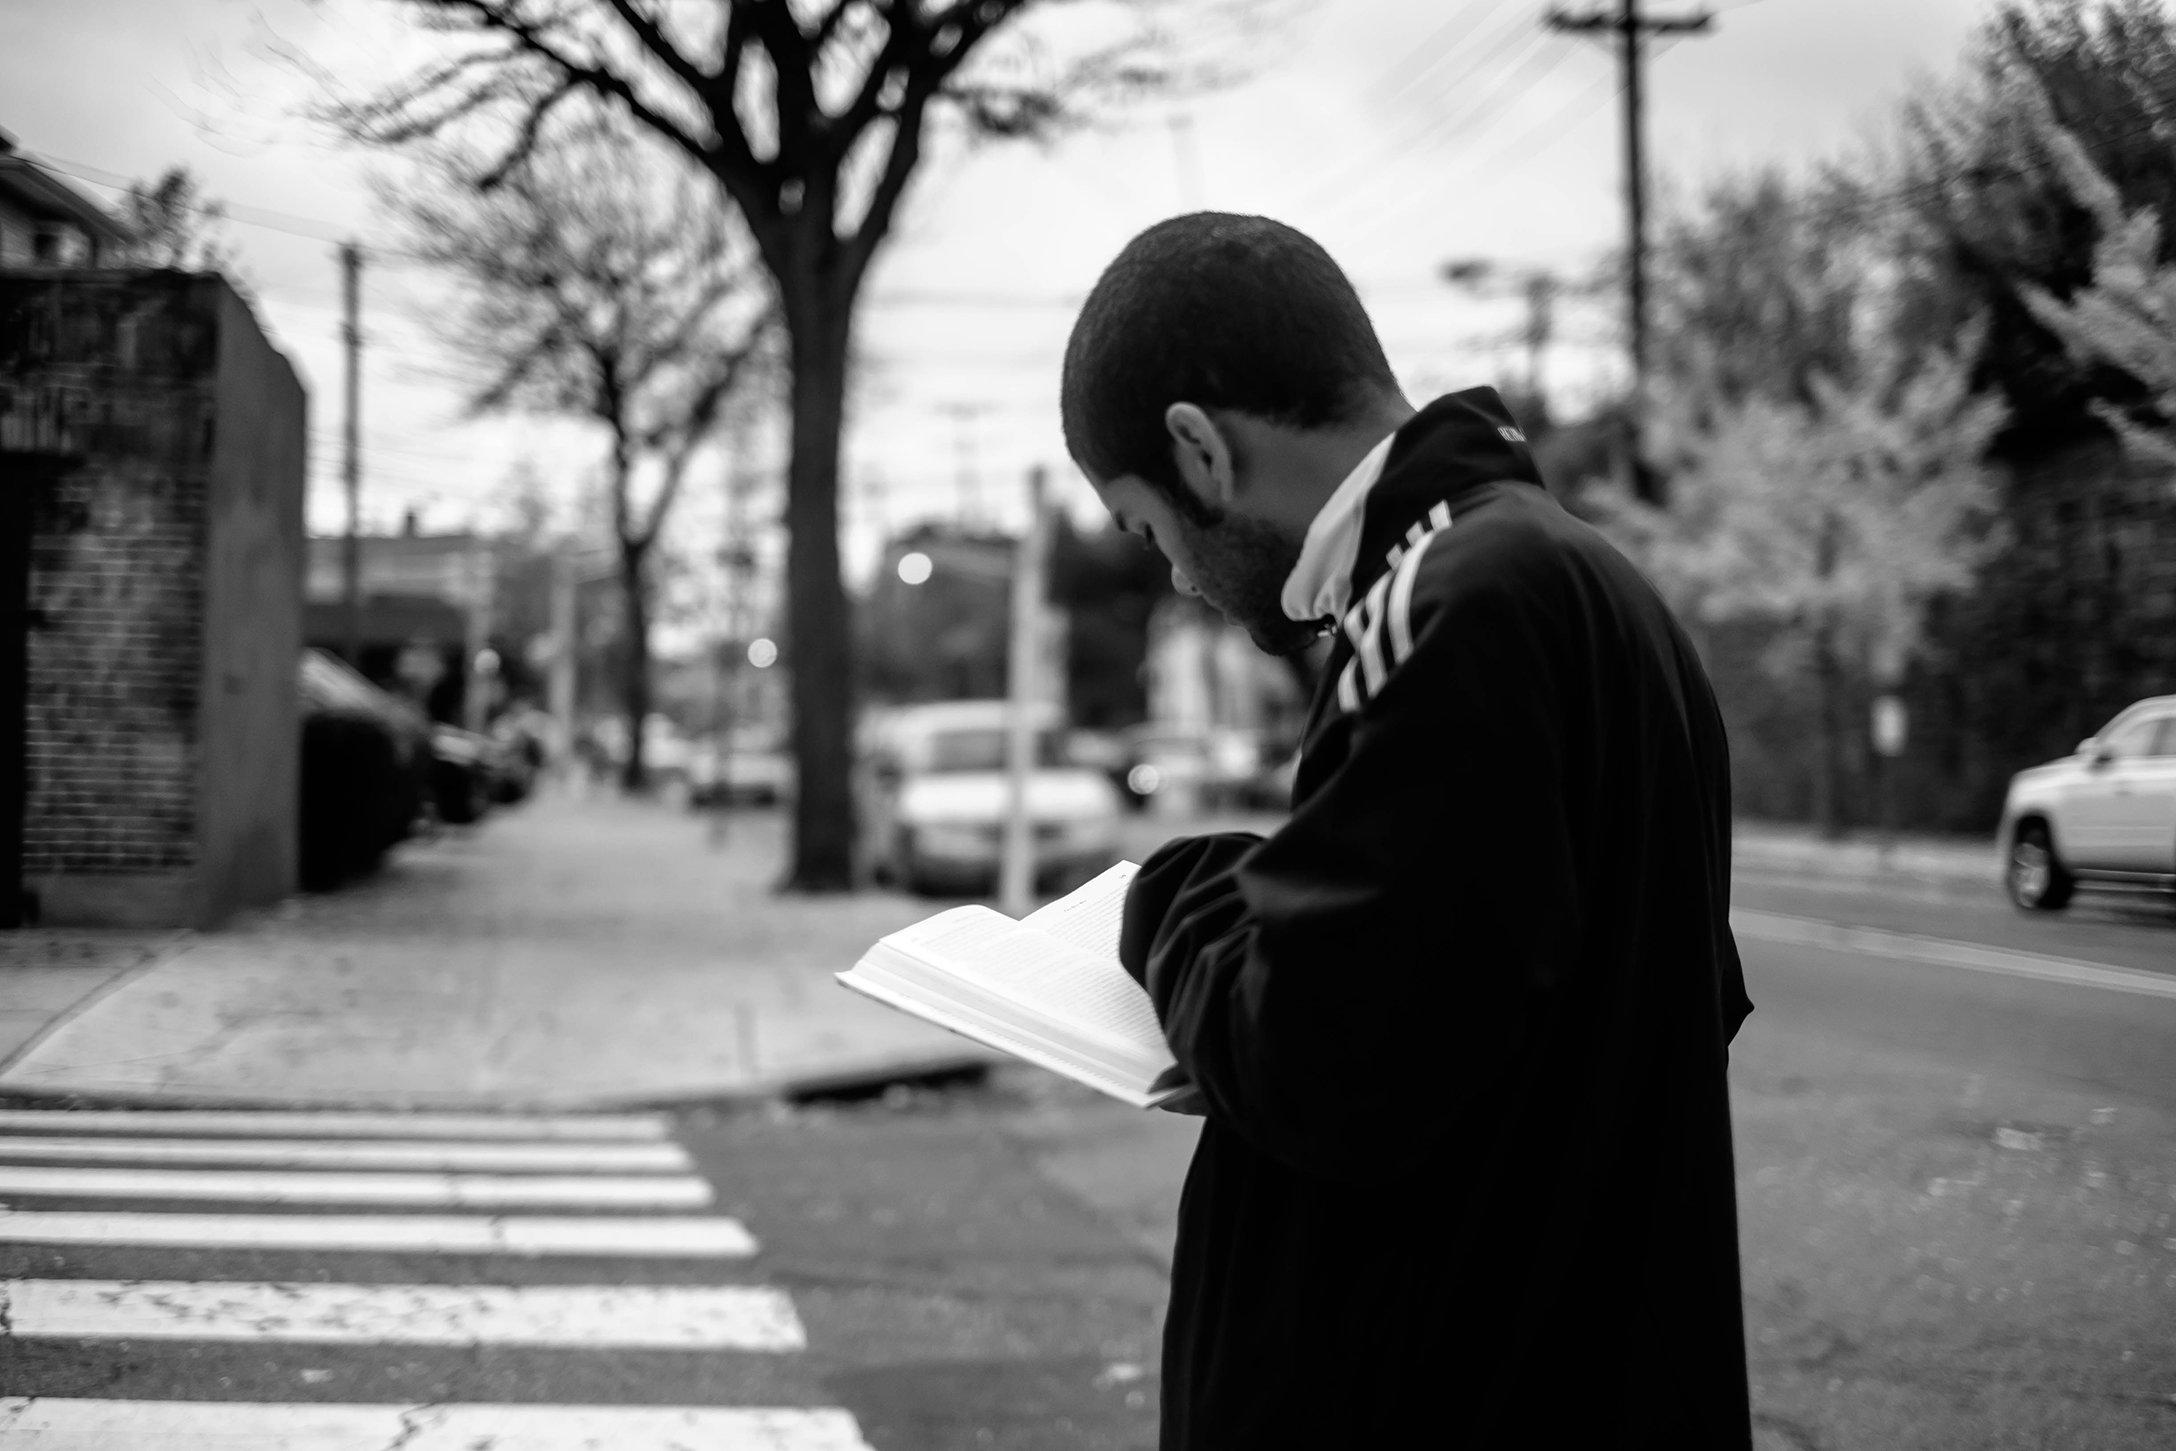 Youngmanreadsbookonstreet.jpg